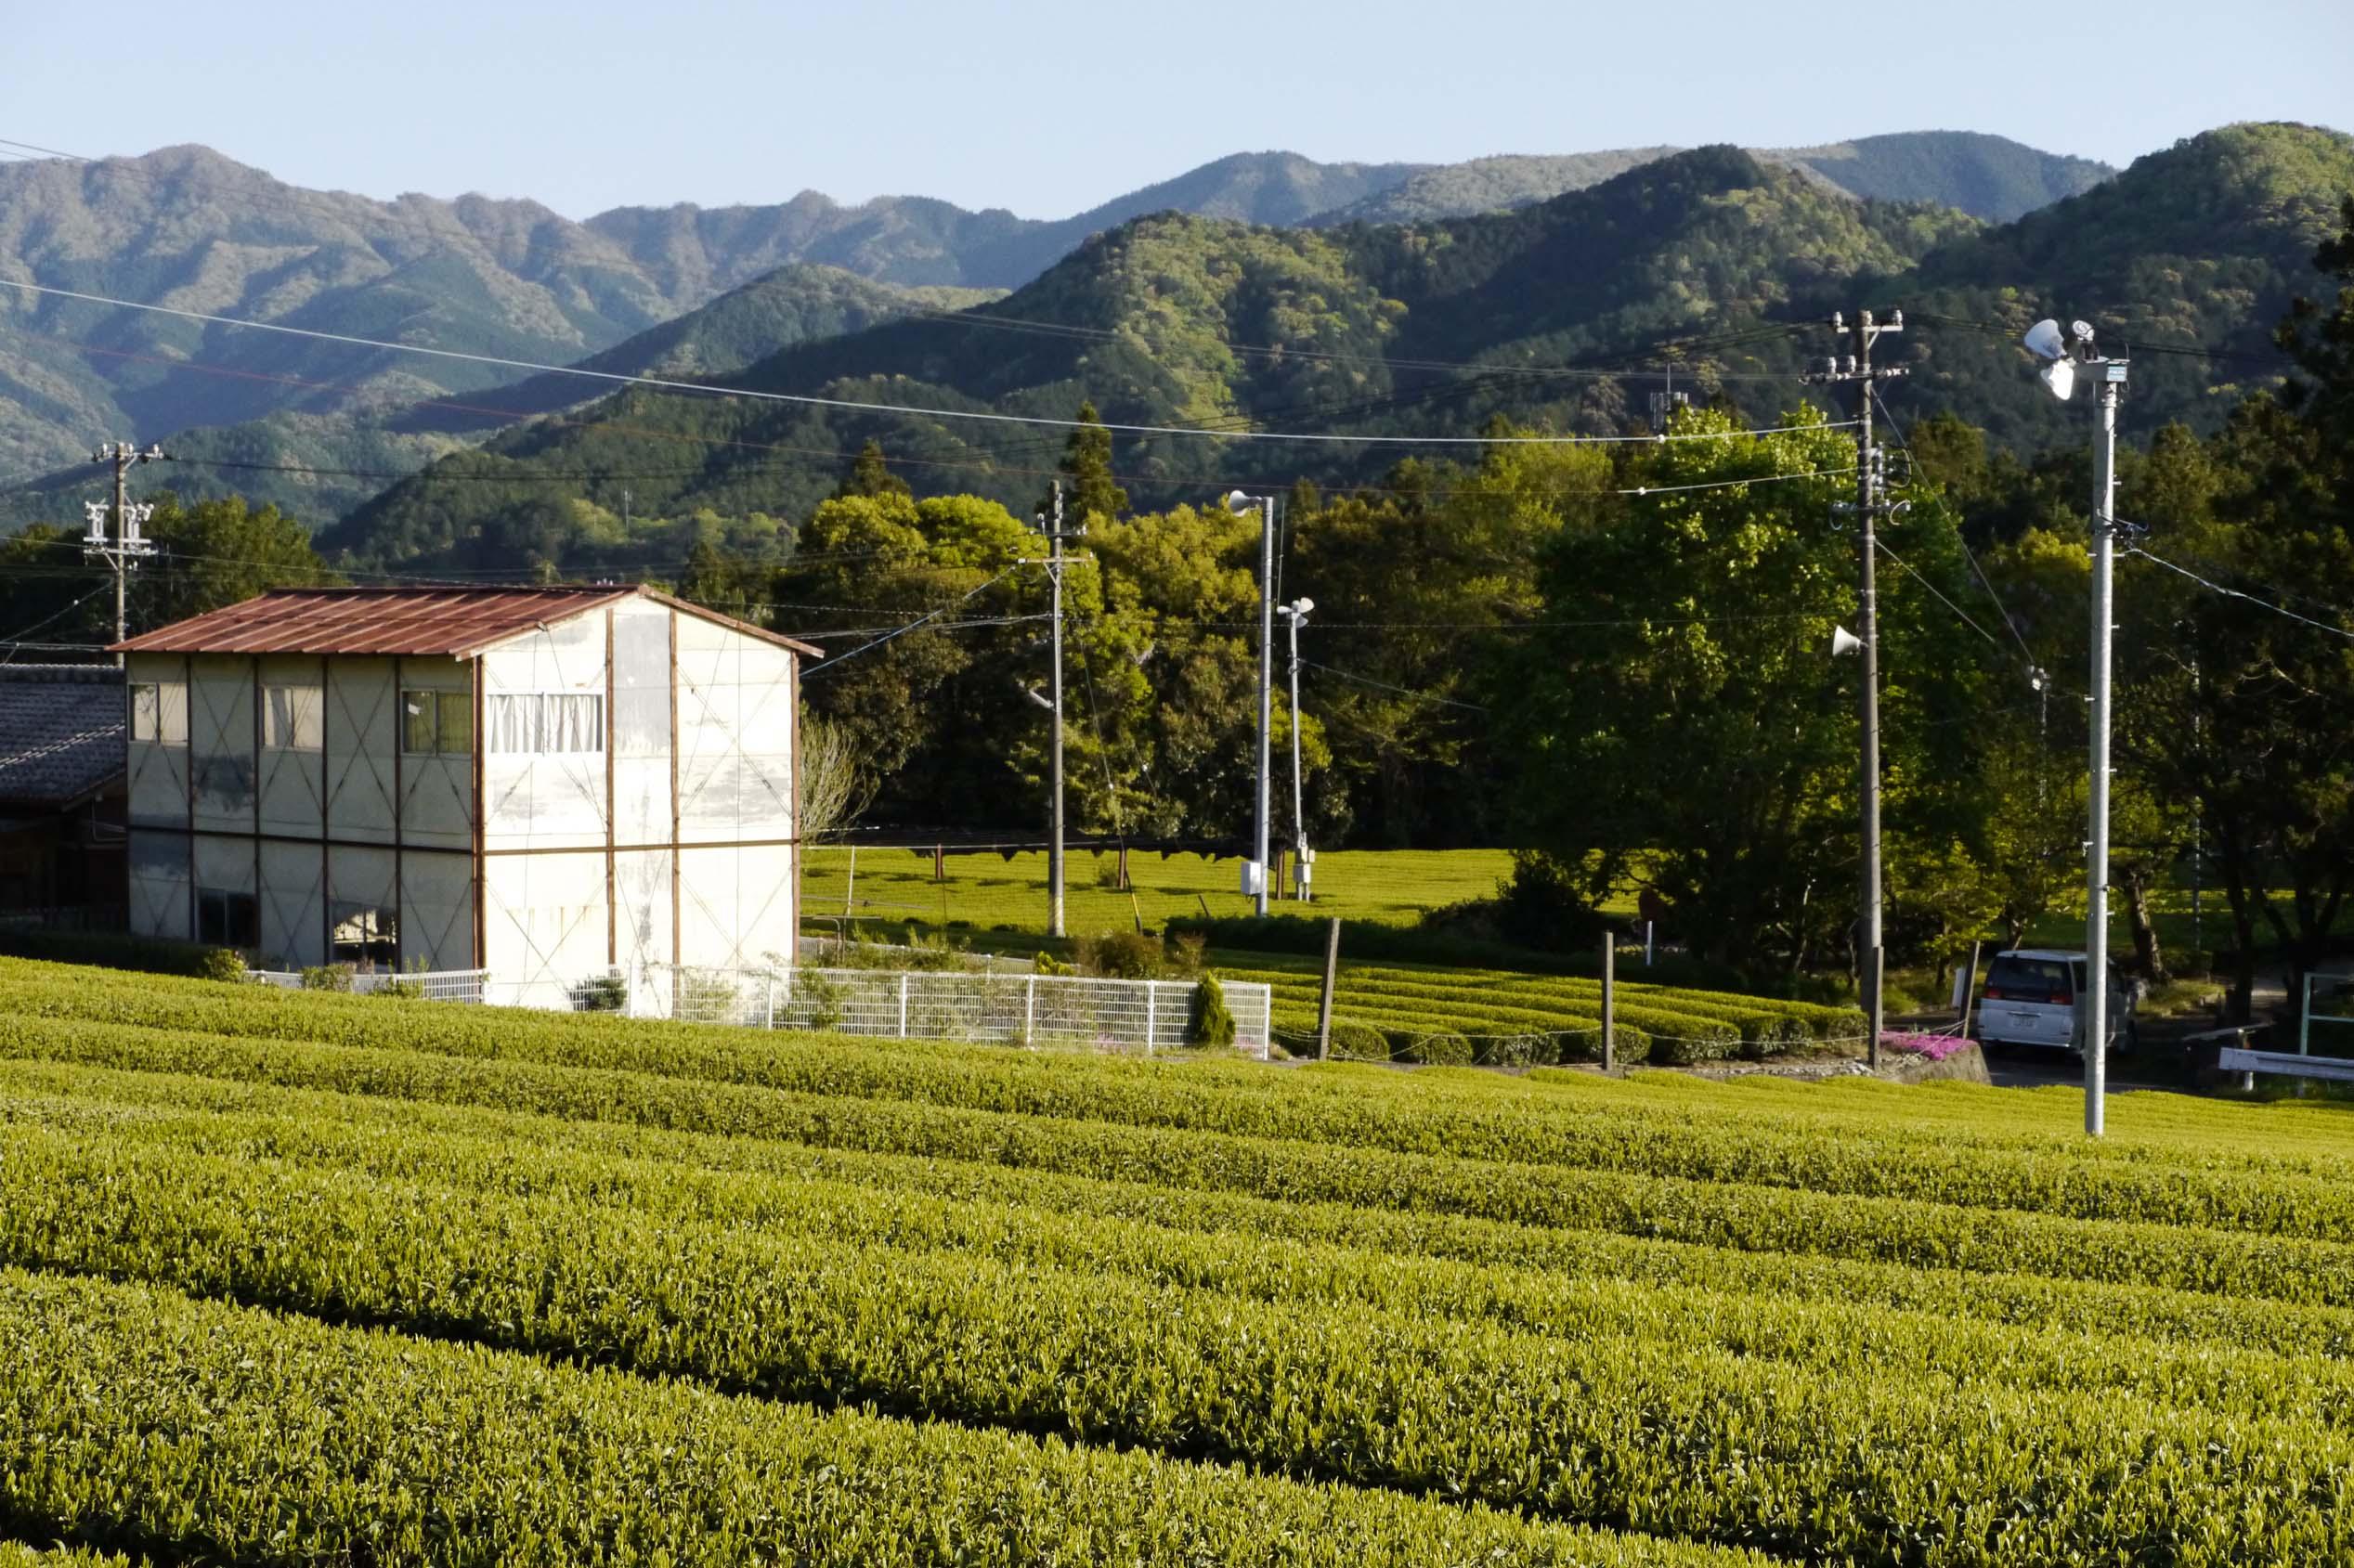 Jardin de thé de Kimihiko et Iwao Hayashi